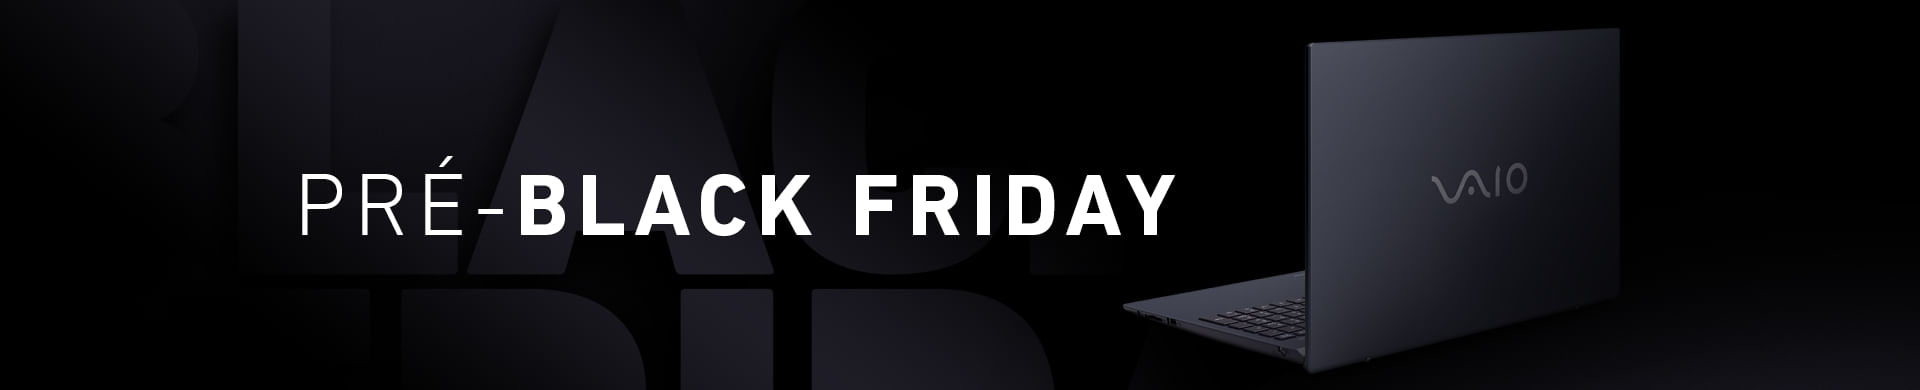 Pré-Black Friday